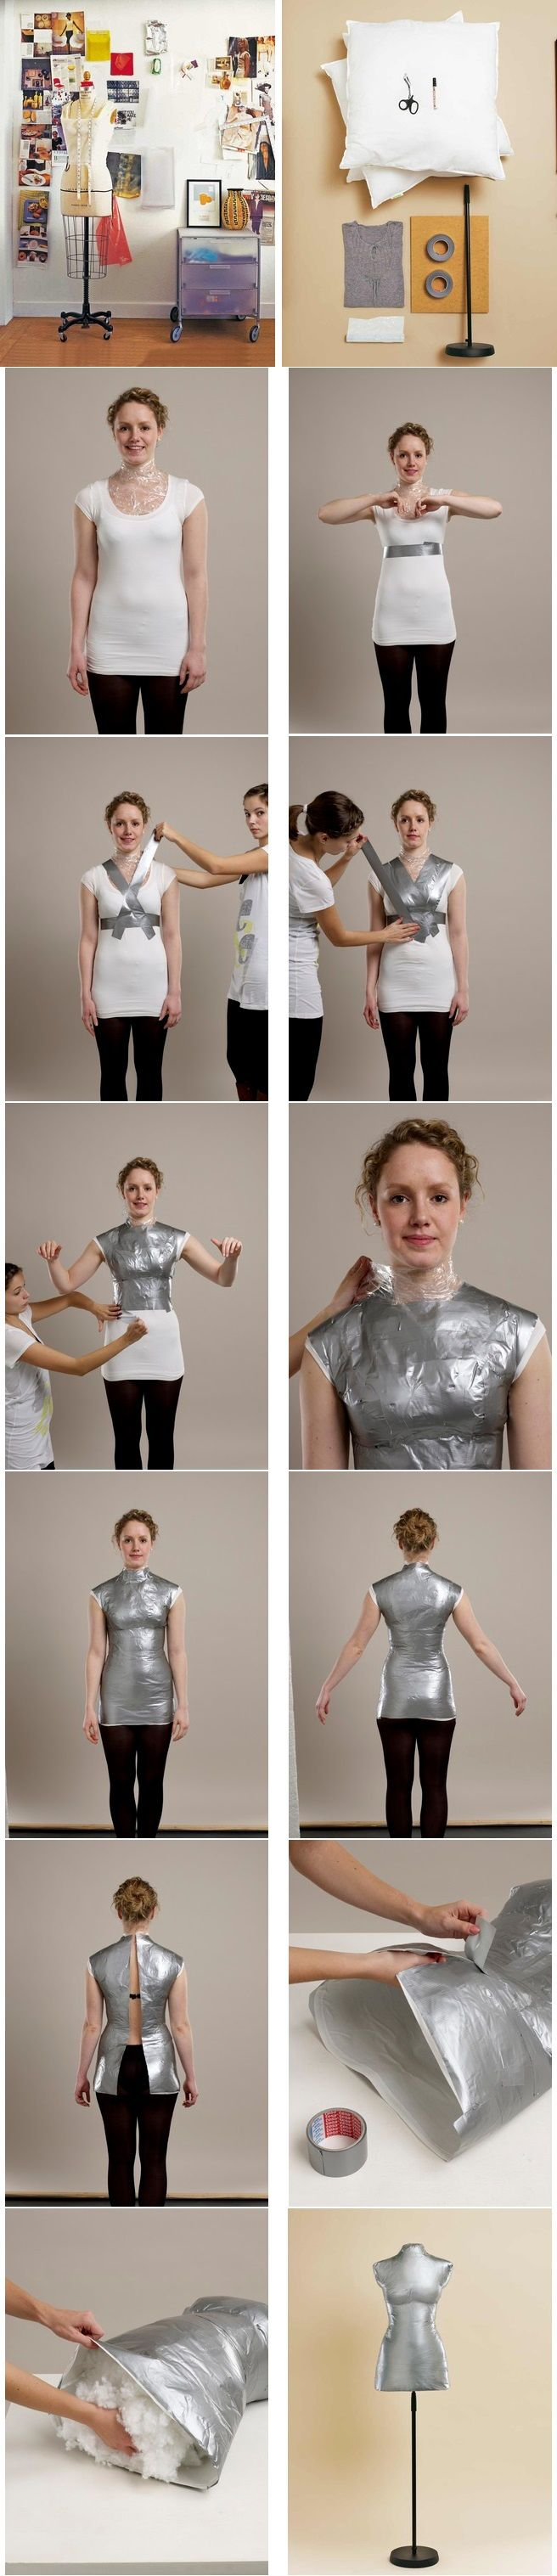 DIY – Vrac tutos coutures ! | Ptimatcha